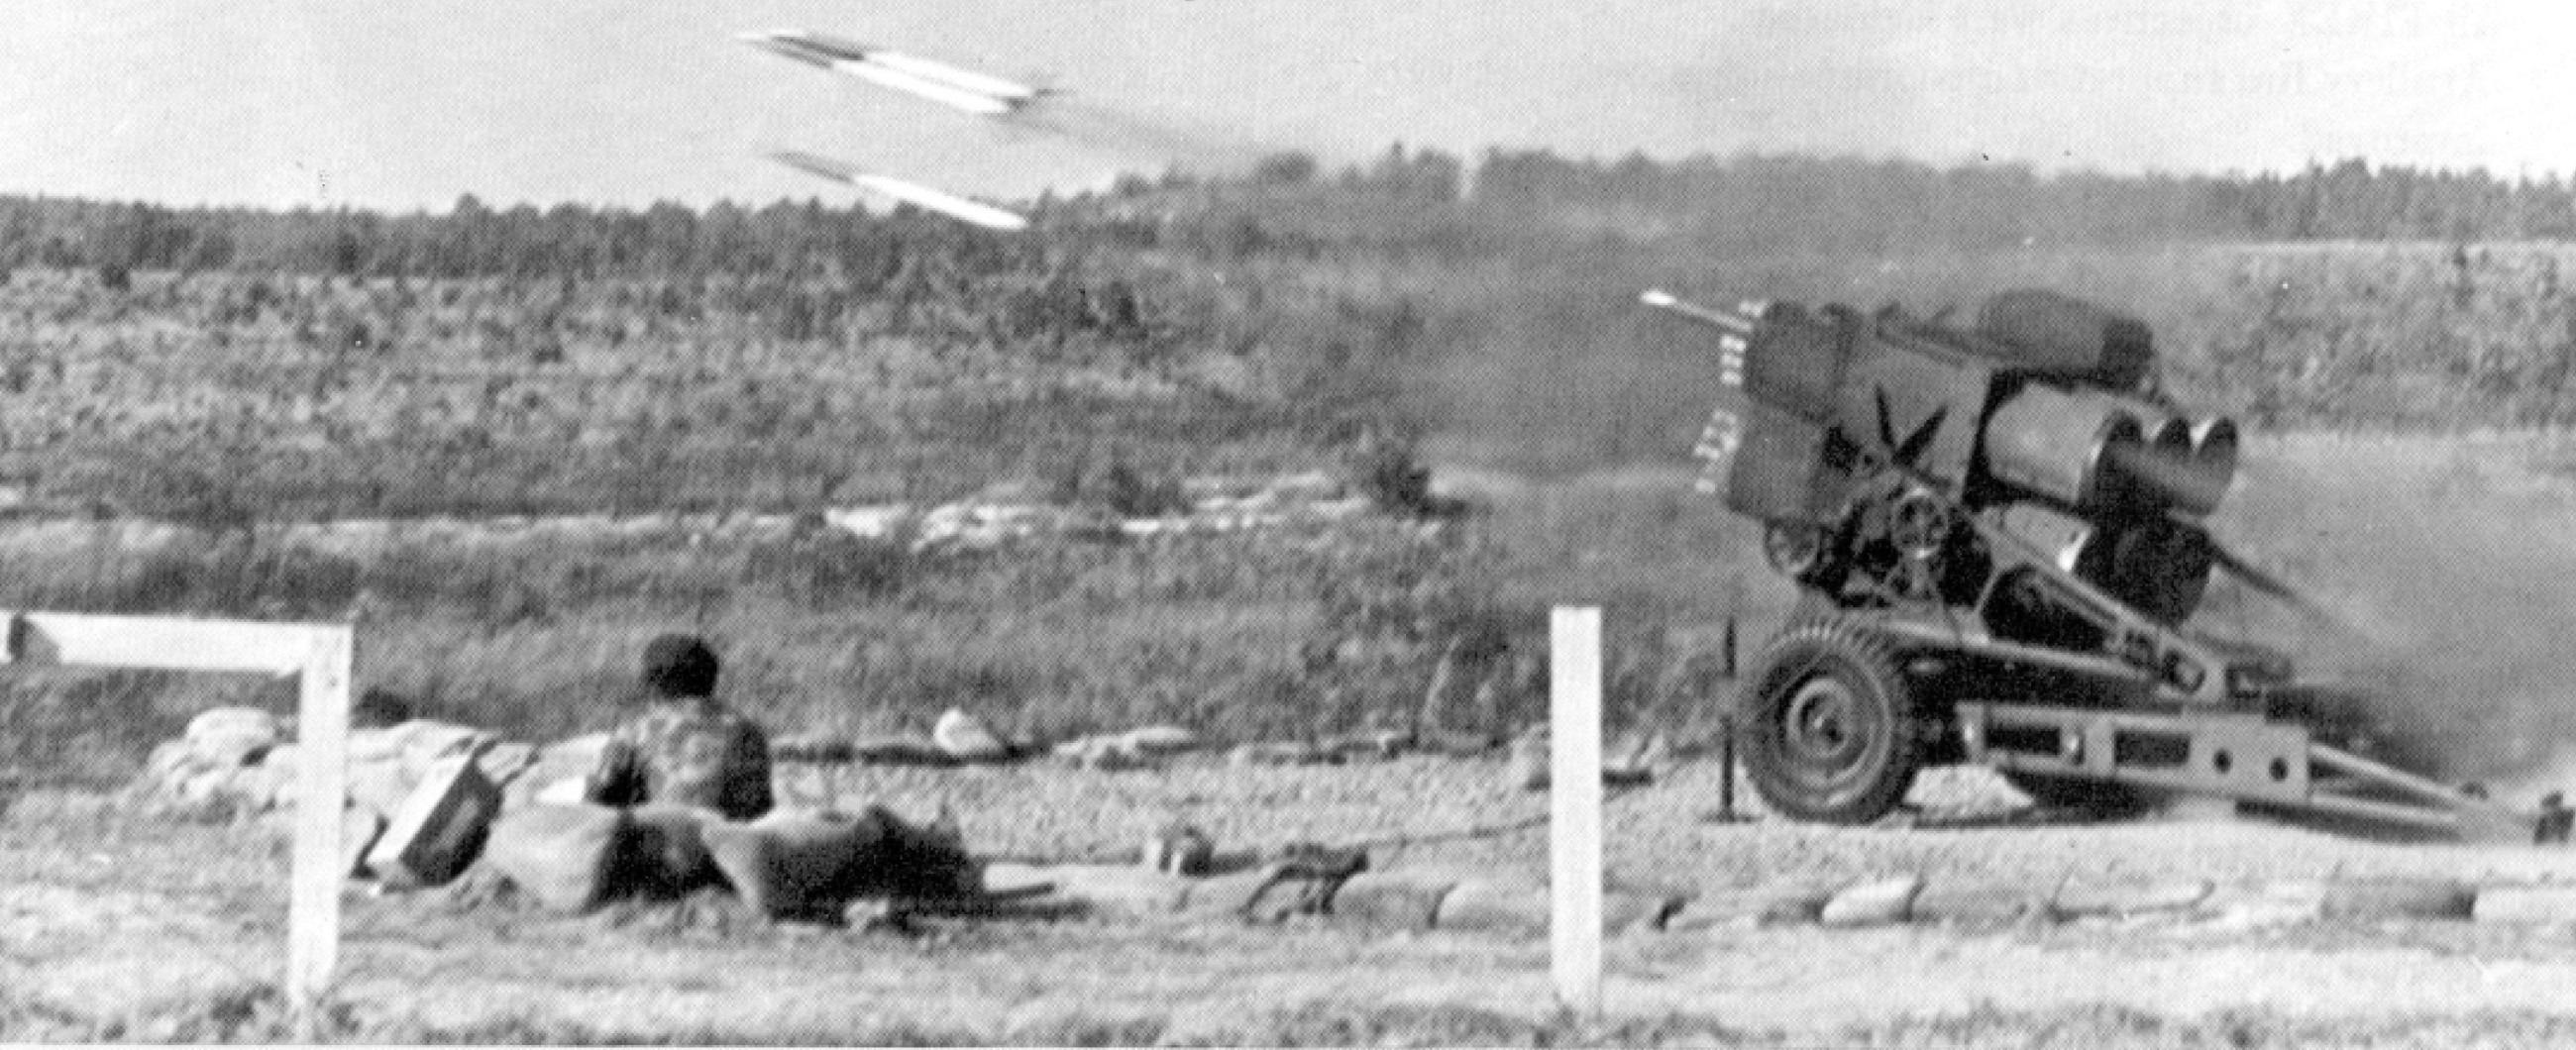 The 'Slammer' Turned Aircraft Rockets Into Ground-Based Artillery - Warrior Maven